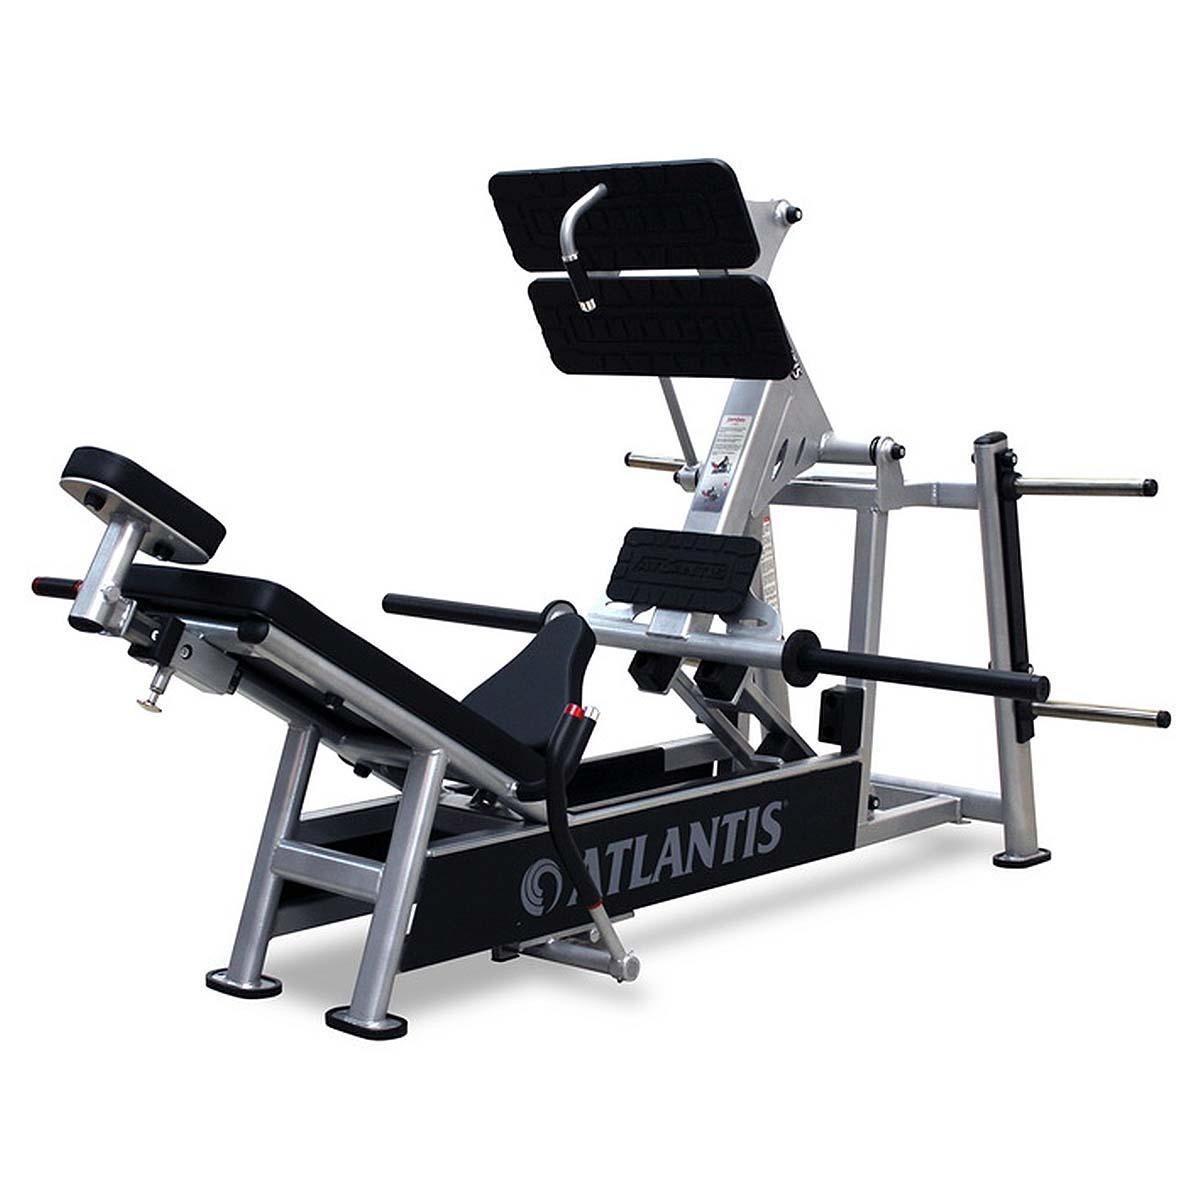 Vancouver Strength Equipment - Atlantis Precision Series - Lifestyle Equipment